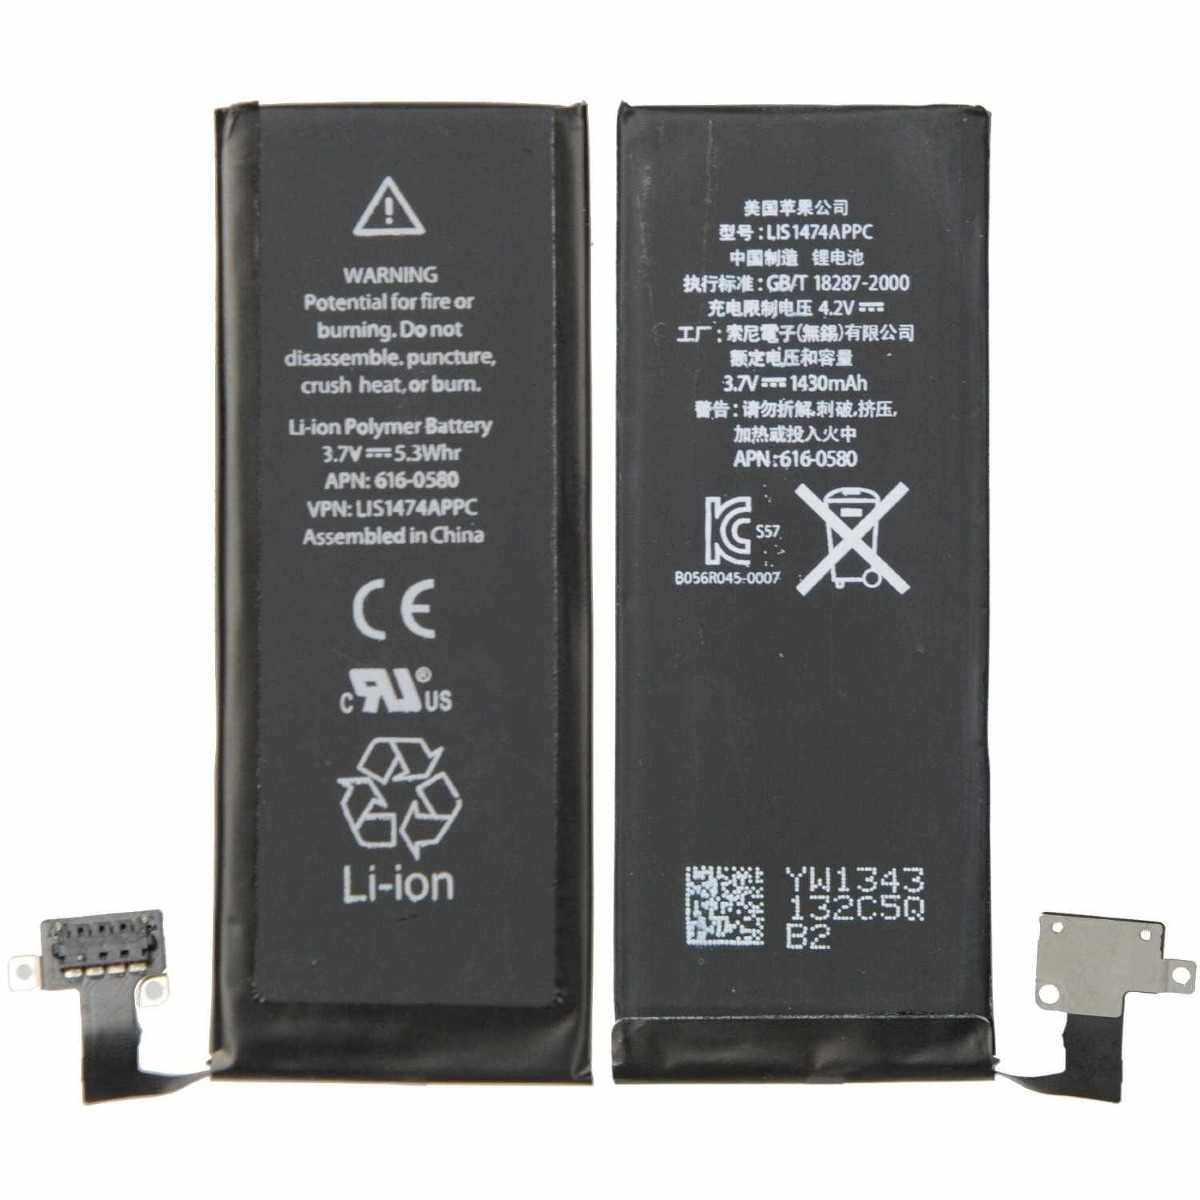 15d21c0c8c6 Bateria Apple iPhone 4s 1430mah 3.7v 616-0580 Li-íon Celular - R$ 45,79 em  Mercado Livre